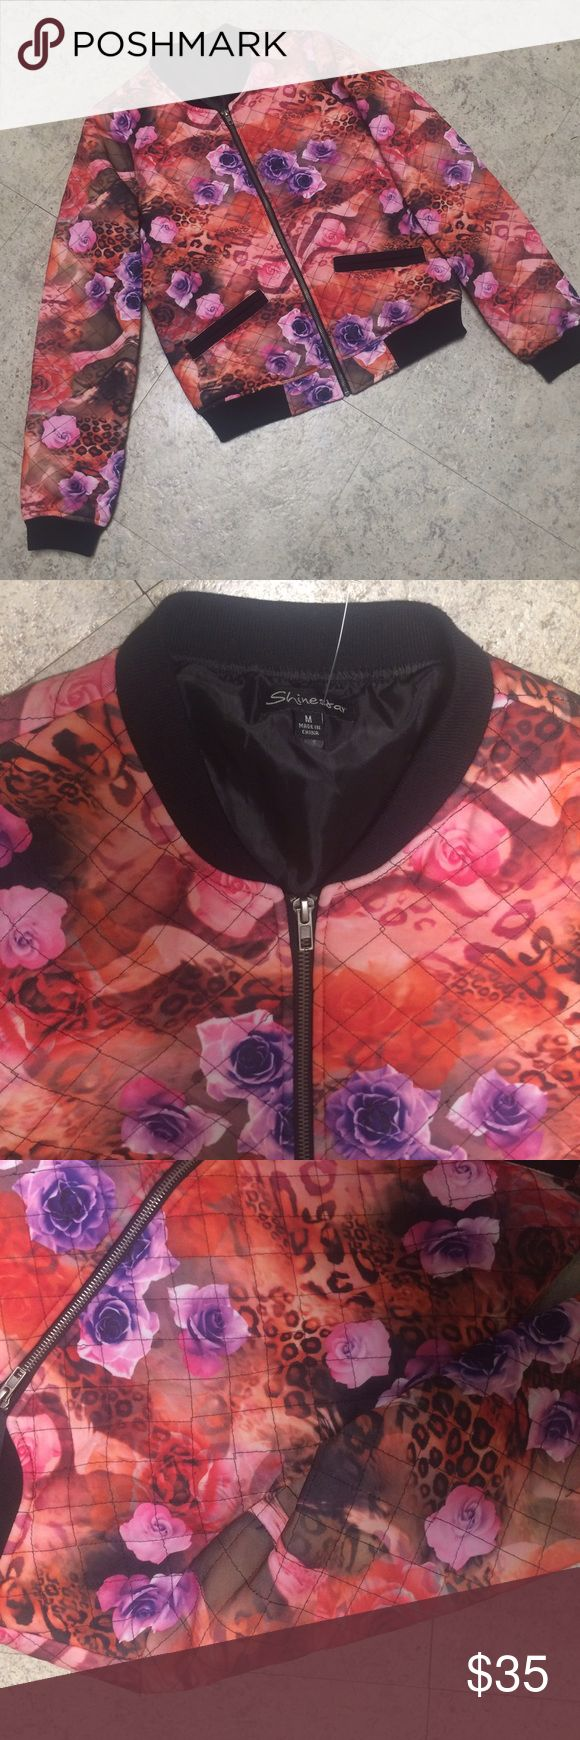 Shinestar printed bomber jacket Like new condition! ASOS Jackets & Coats